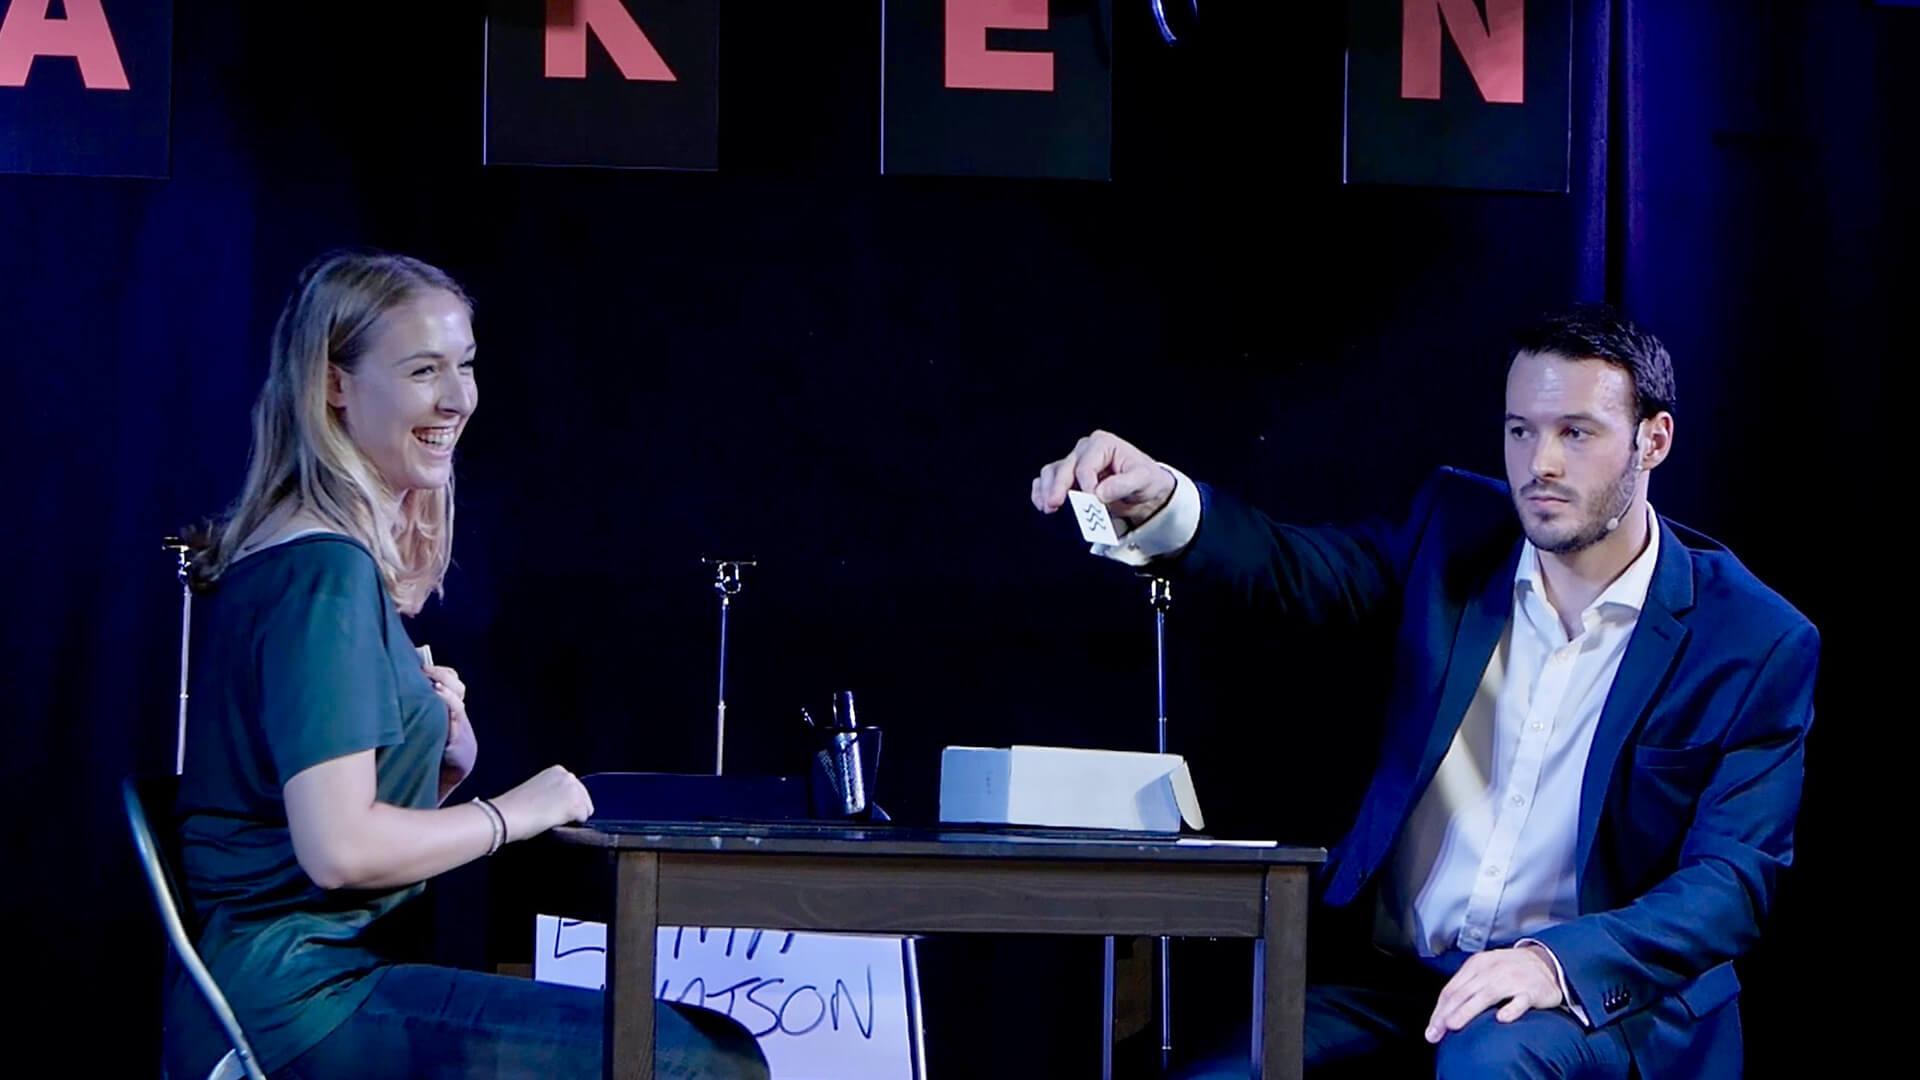 Aaron Calvert on stage at the Edinburgh Fringe Festival